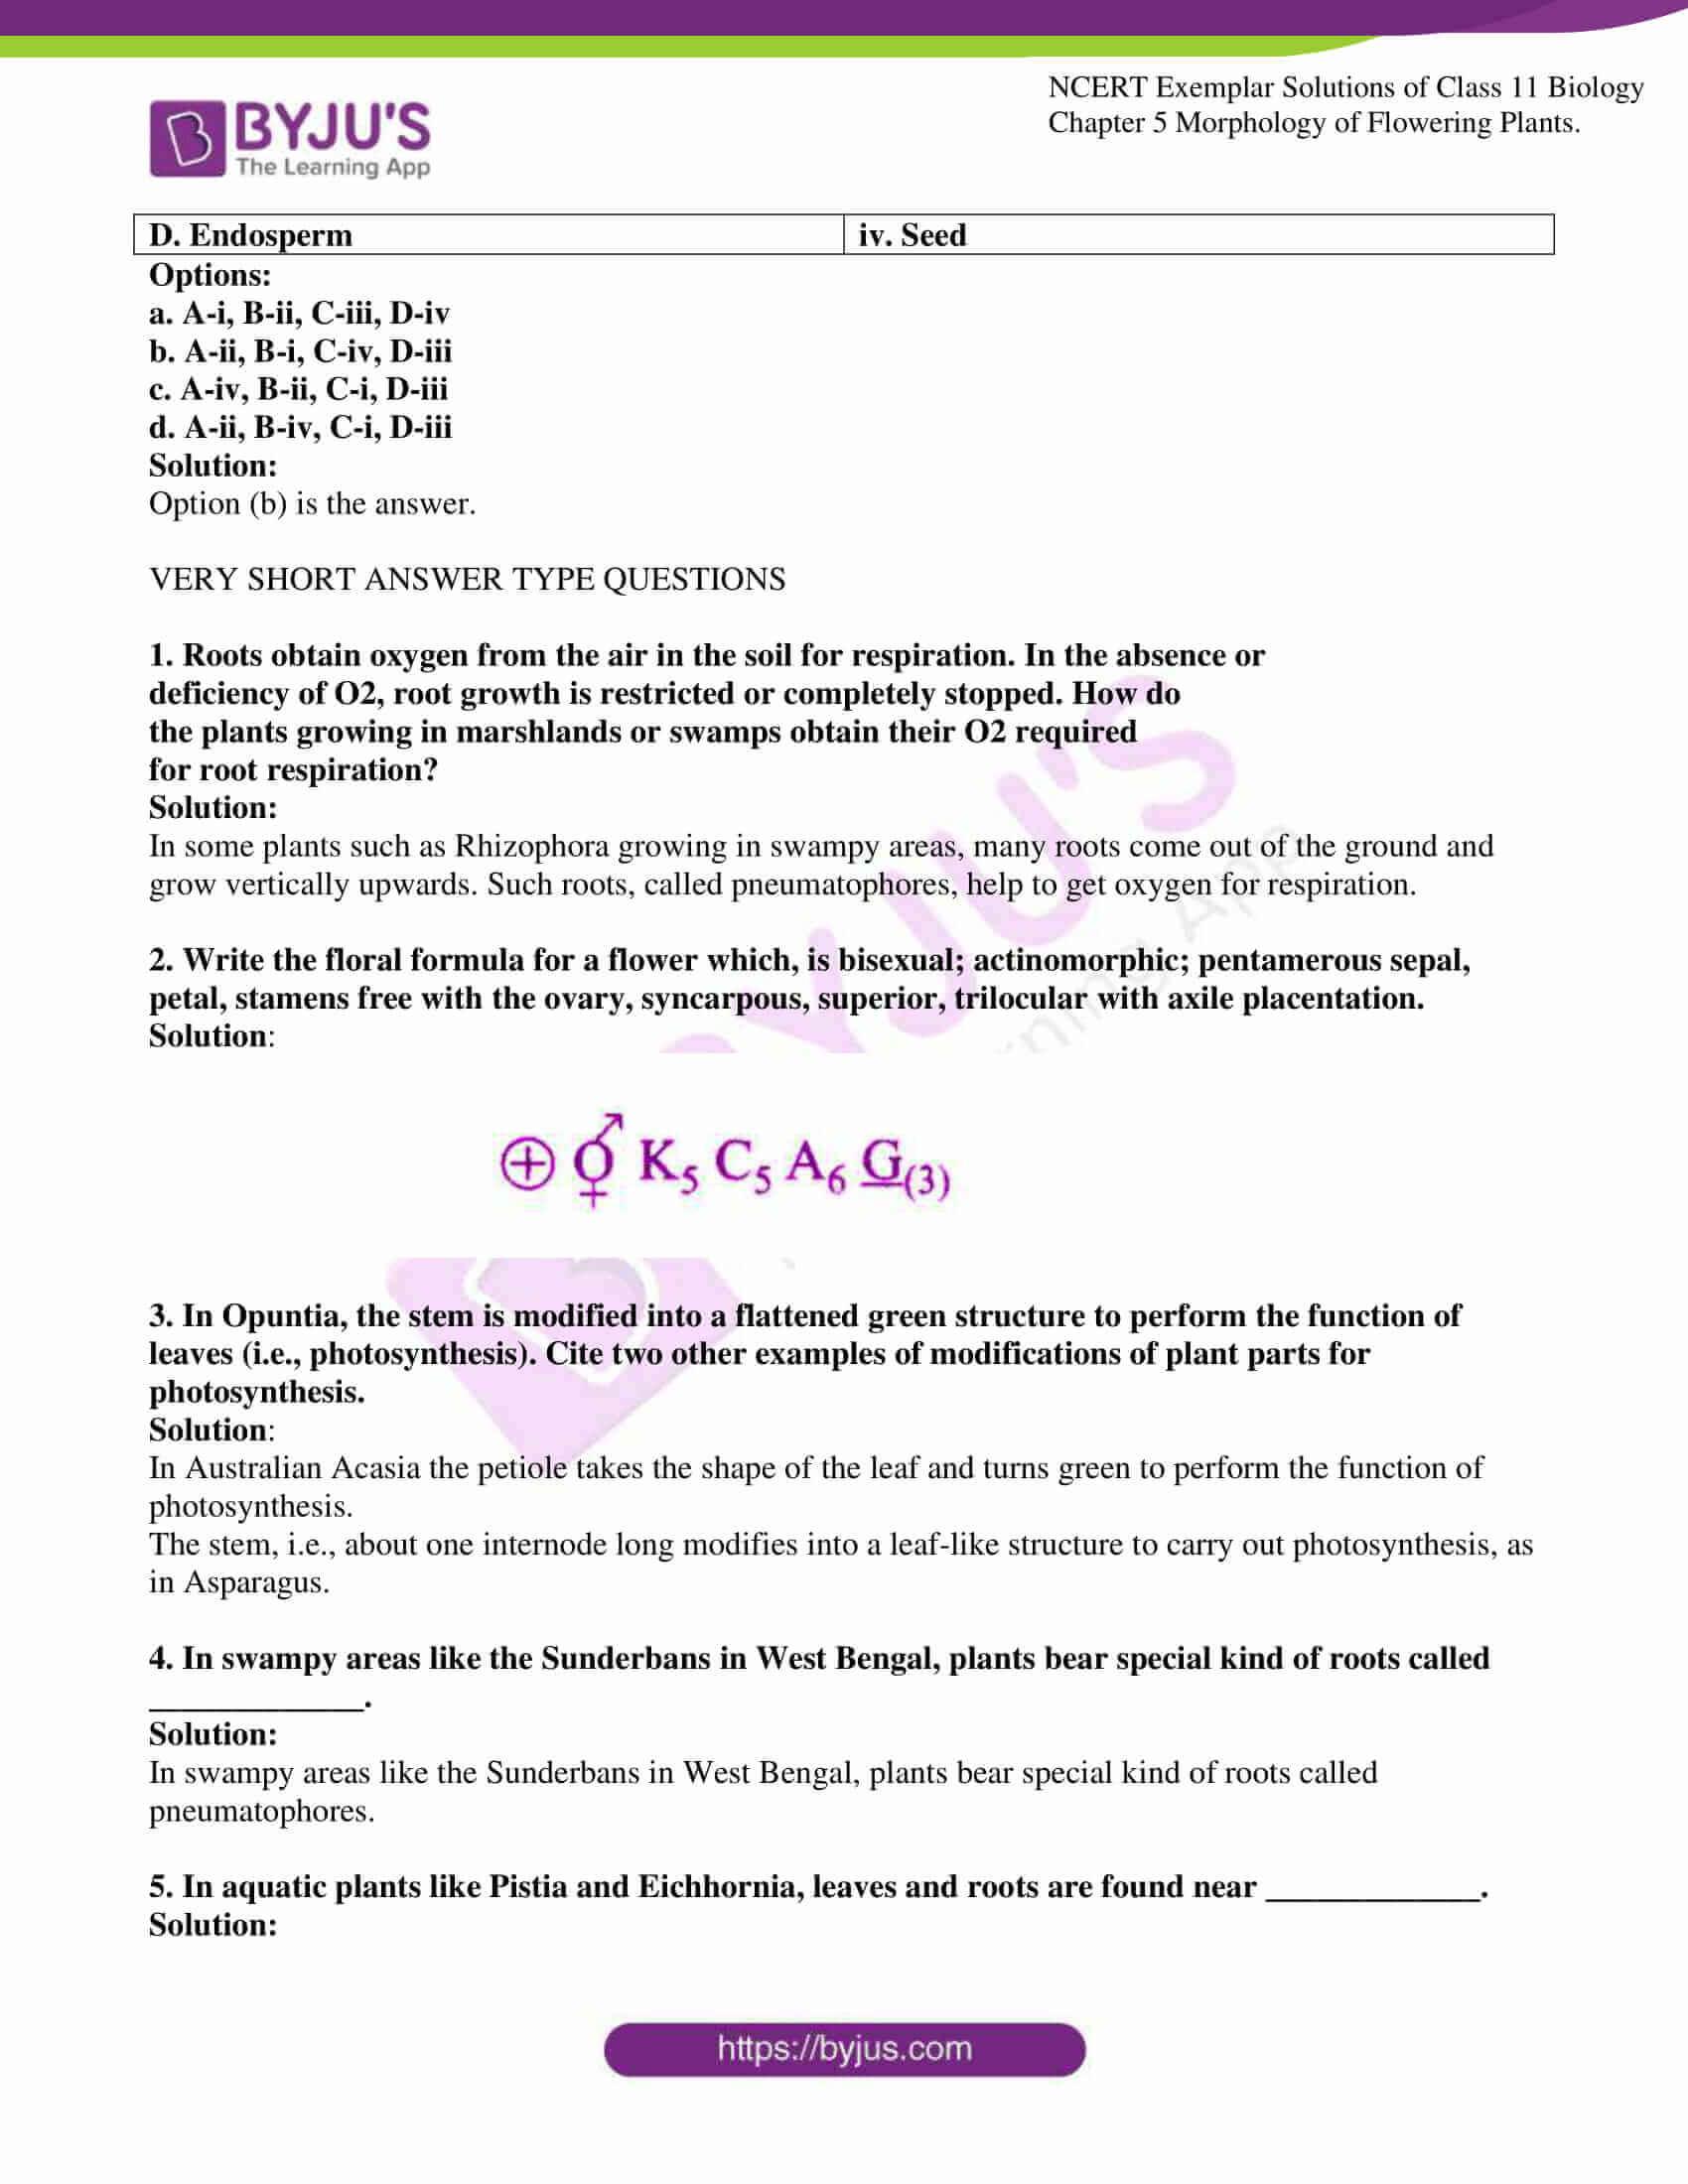 ncert exemplar solutions for class 11 bio chapter 5 03